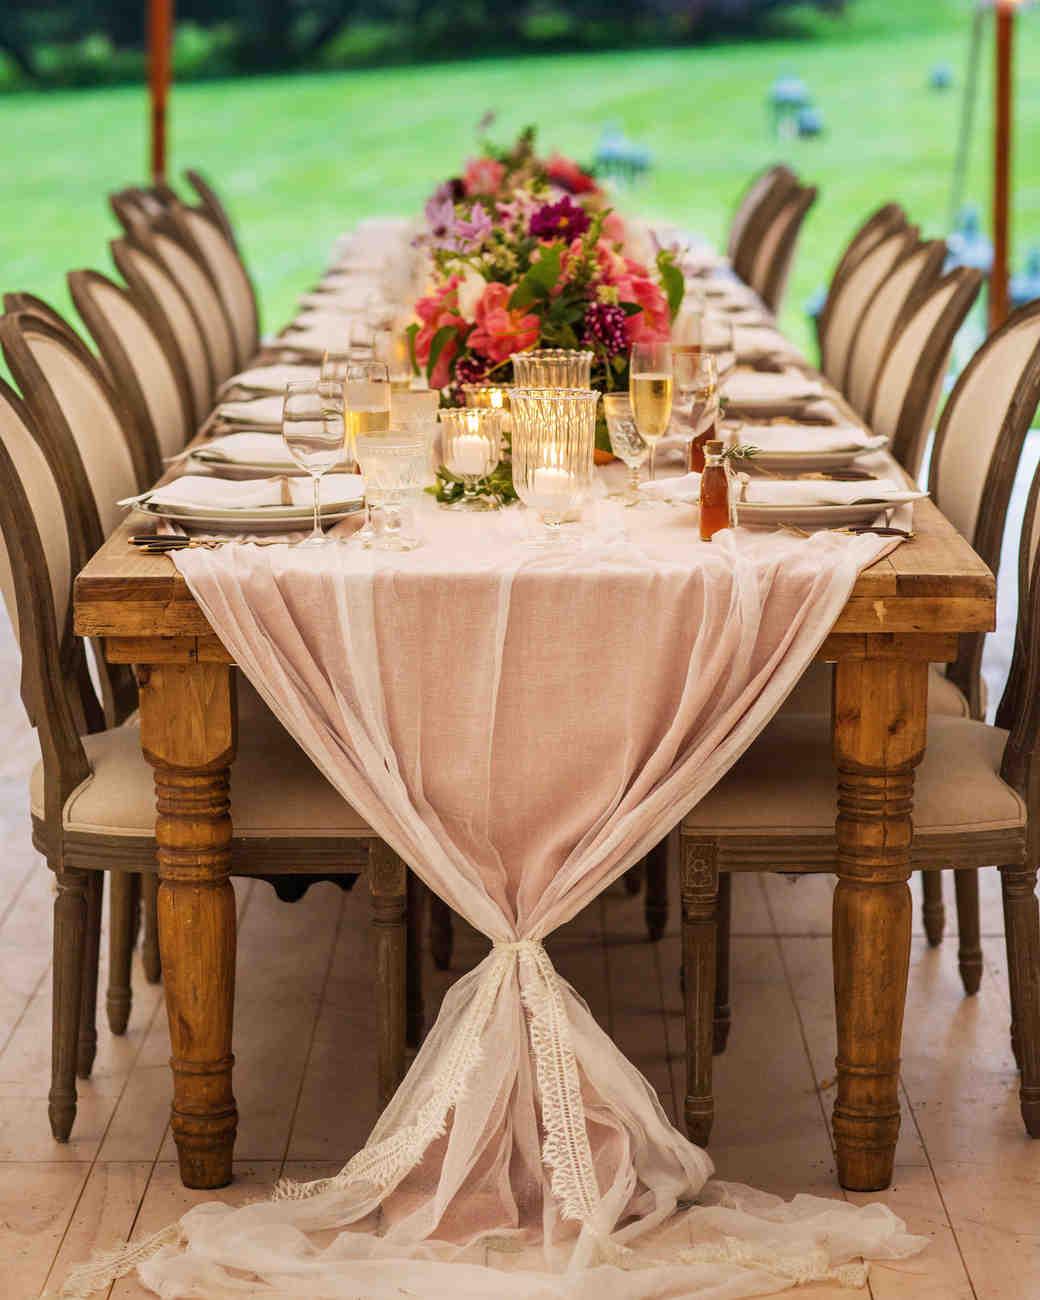 kaitlyn-robert-wedding-table-0143-s112718-0316.jpg